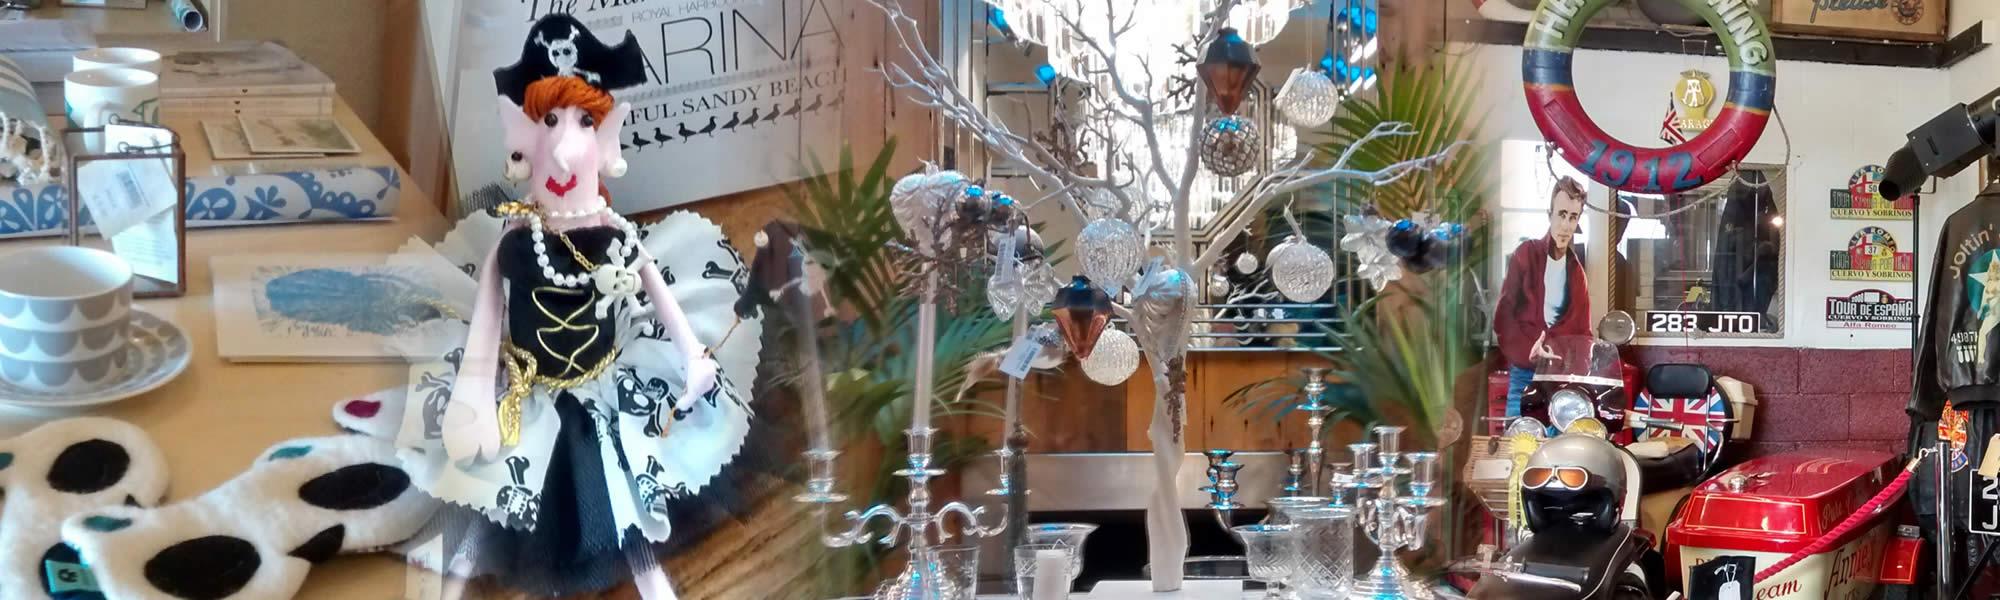 Retro and Vintage shopping - Visit Ramsgate